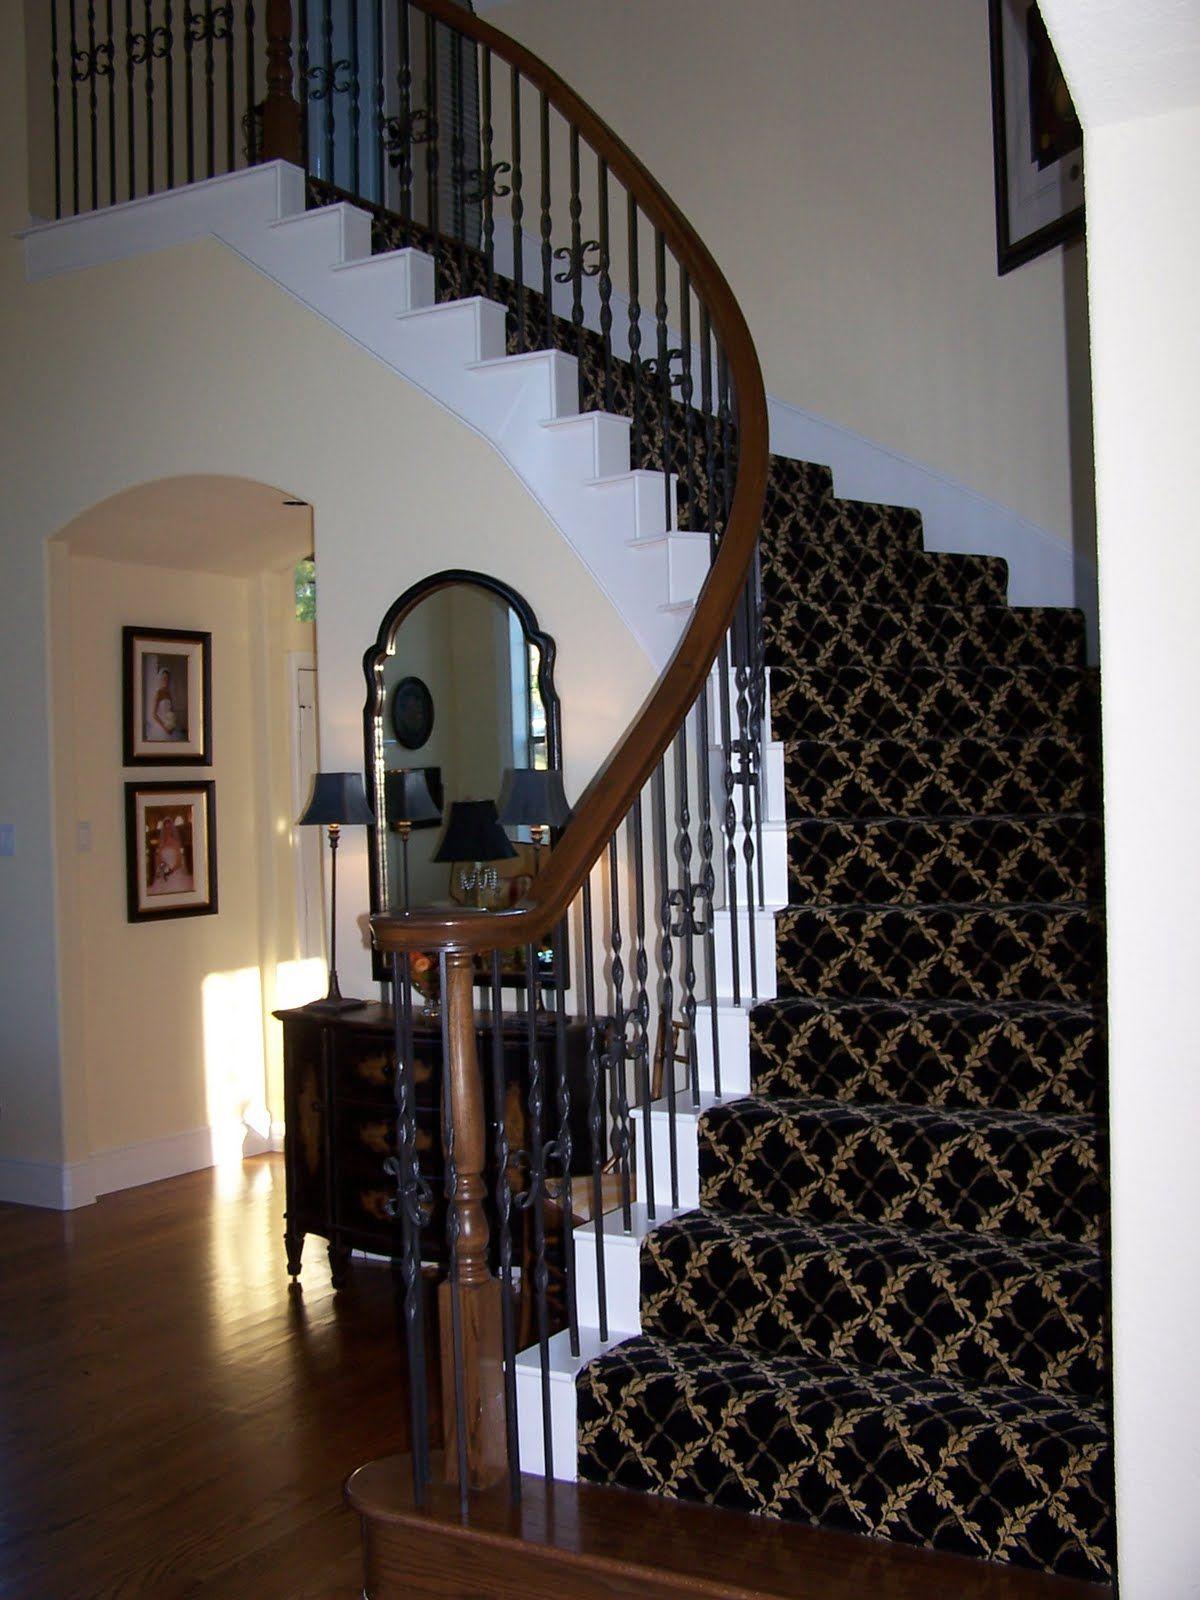 Best Dark Patterened Carpet Patterned Carpet Home Home Decor 400 x 300